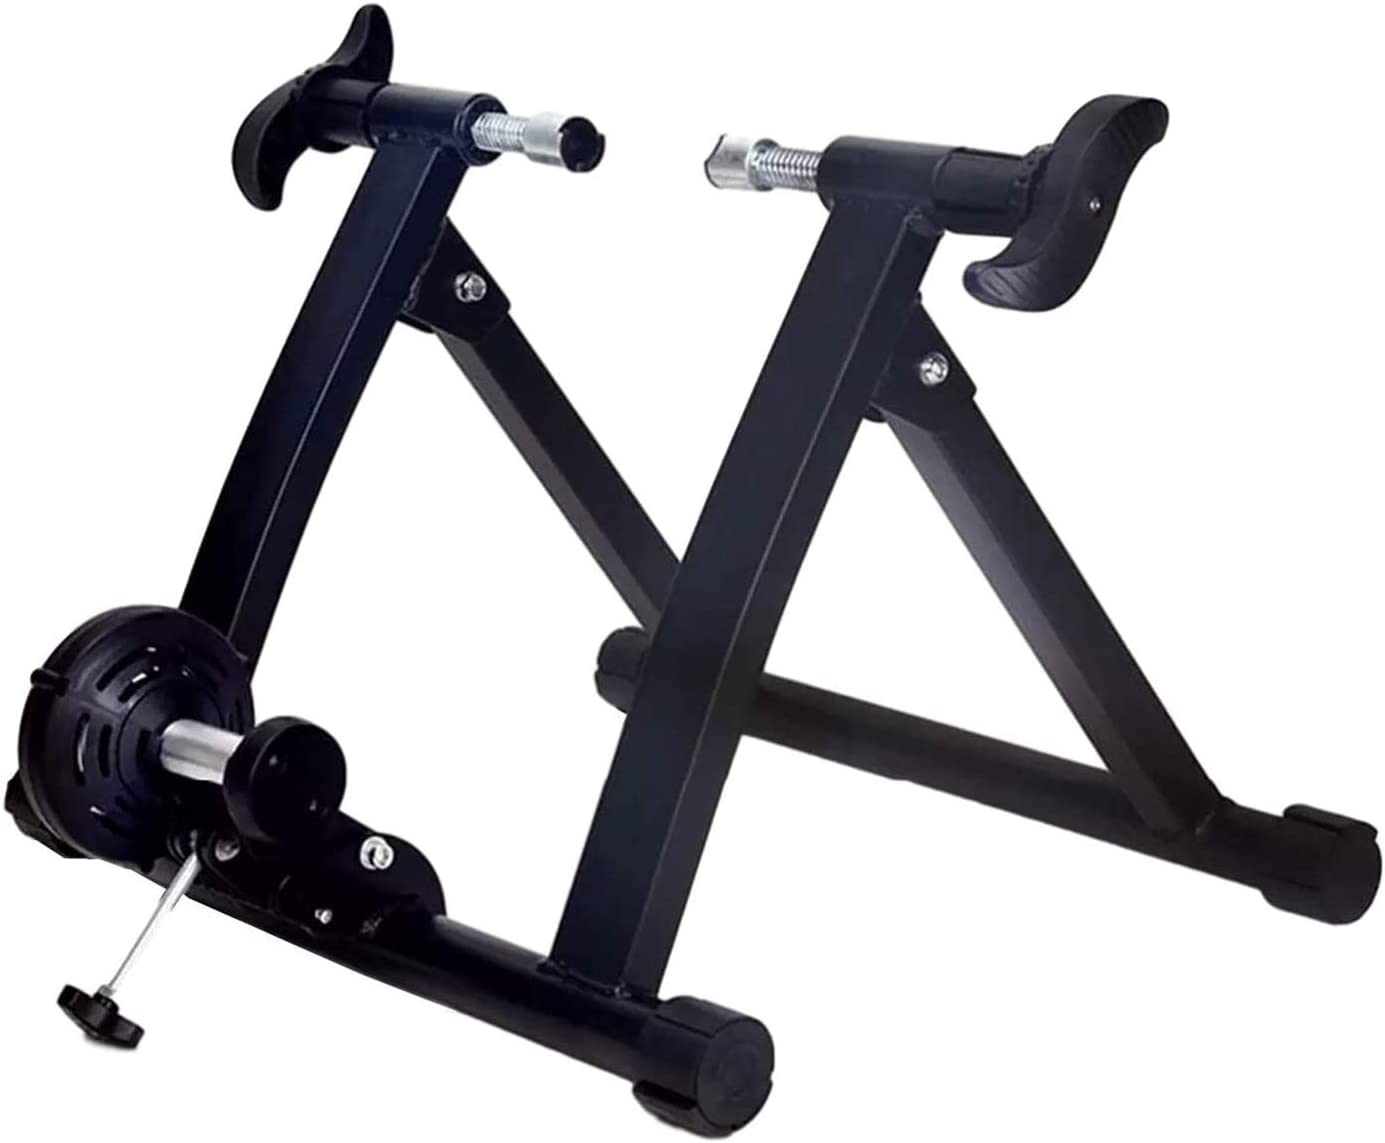 DSWHM Bike Trainer Max 40% OFF Superior Stand Sports Fitnes Indoor